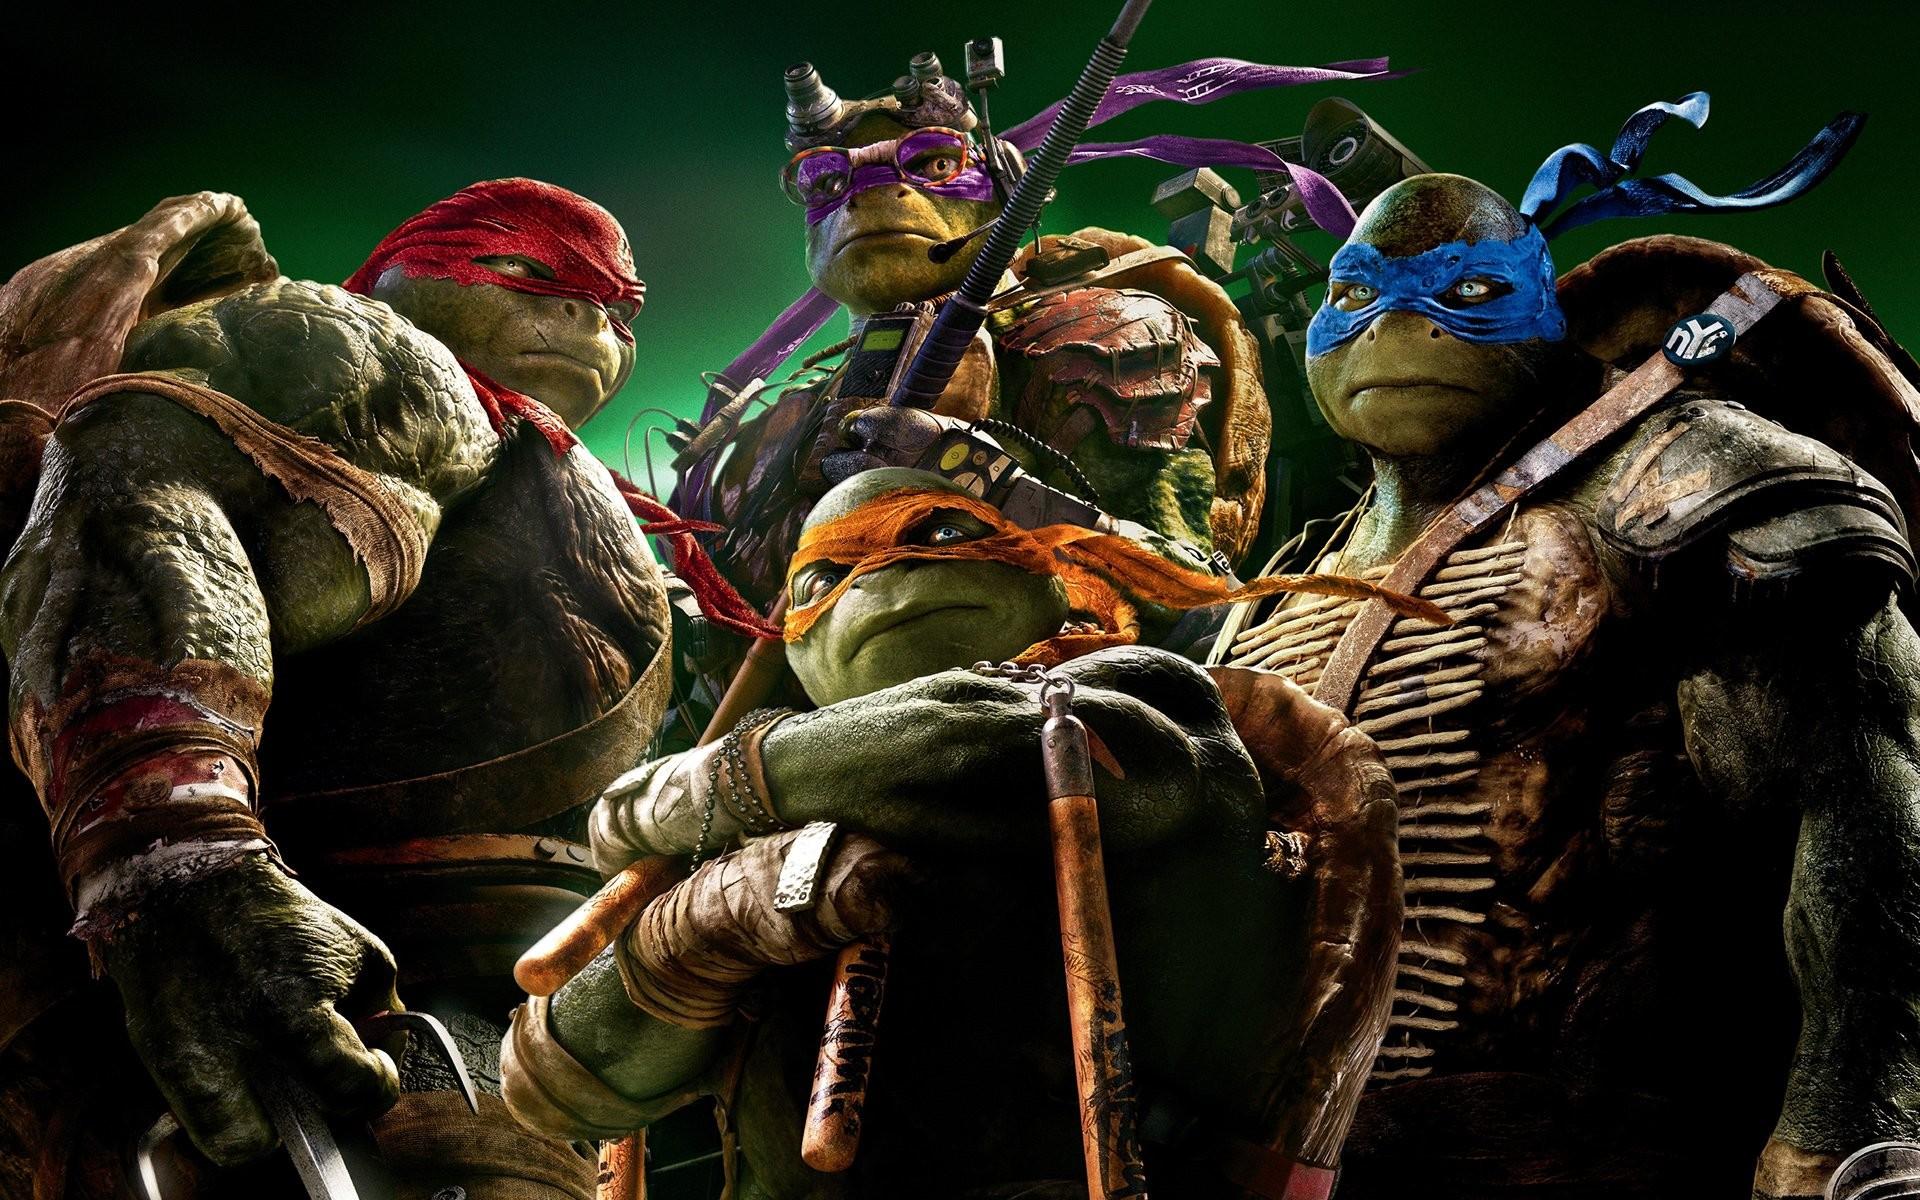 Res: 1920x1200, HD Wallpaper | Background Image ID:616518.  Movie Teenage Mutant  Ninja Turtles ...